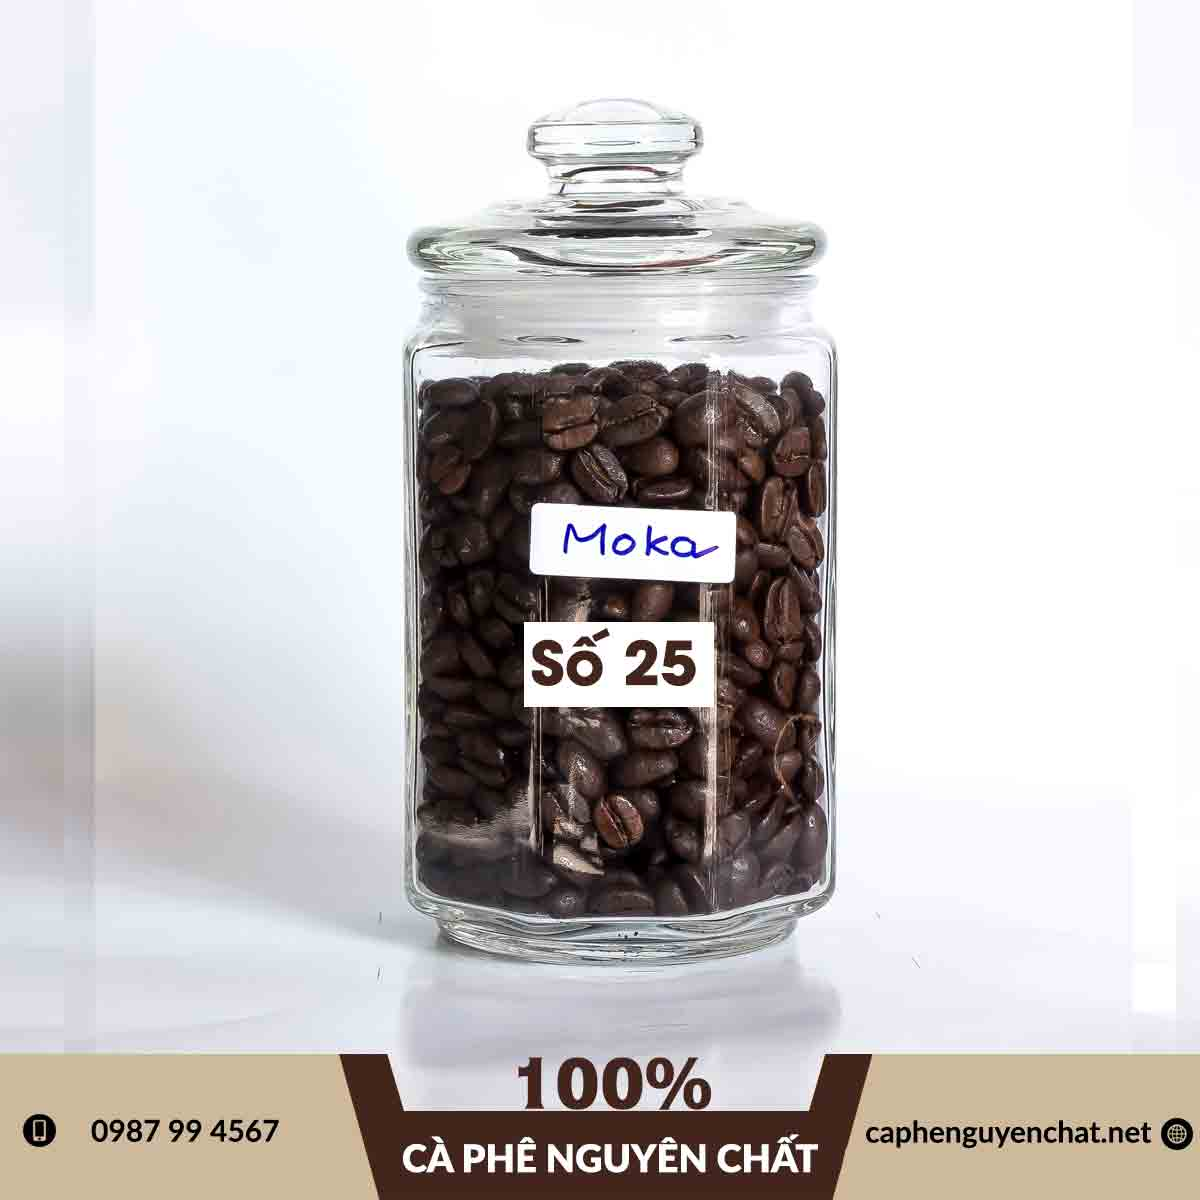 ca-phe-moka-cau-dat-so25